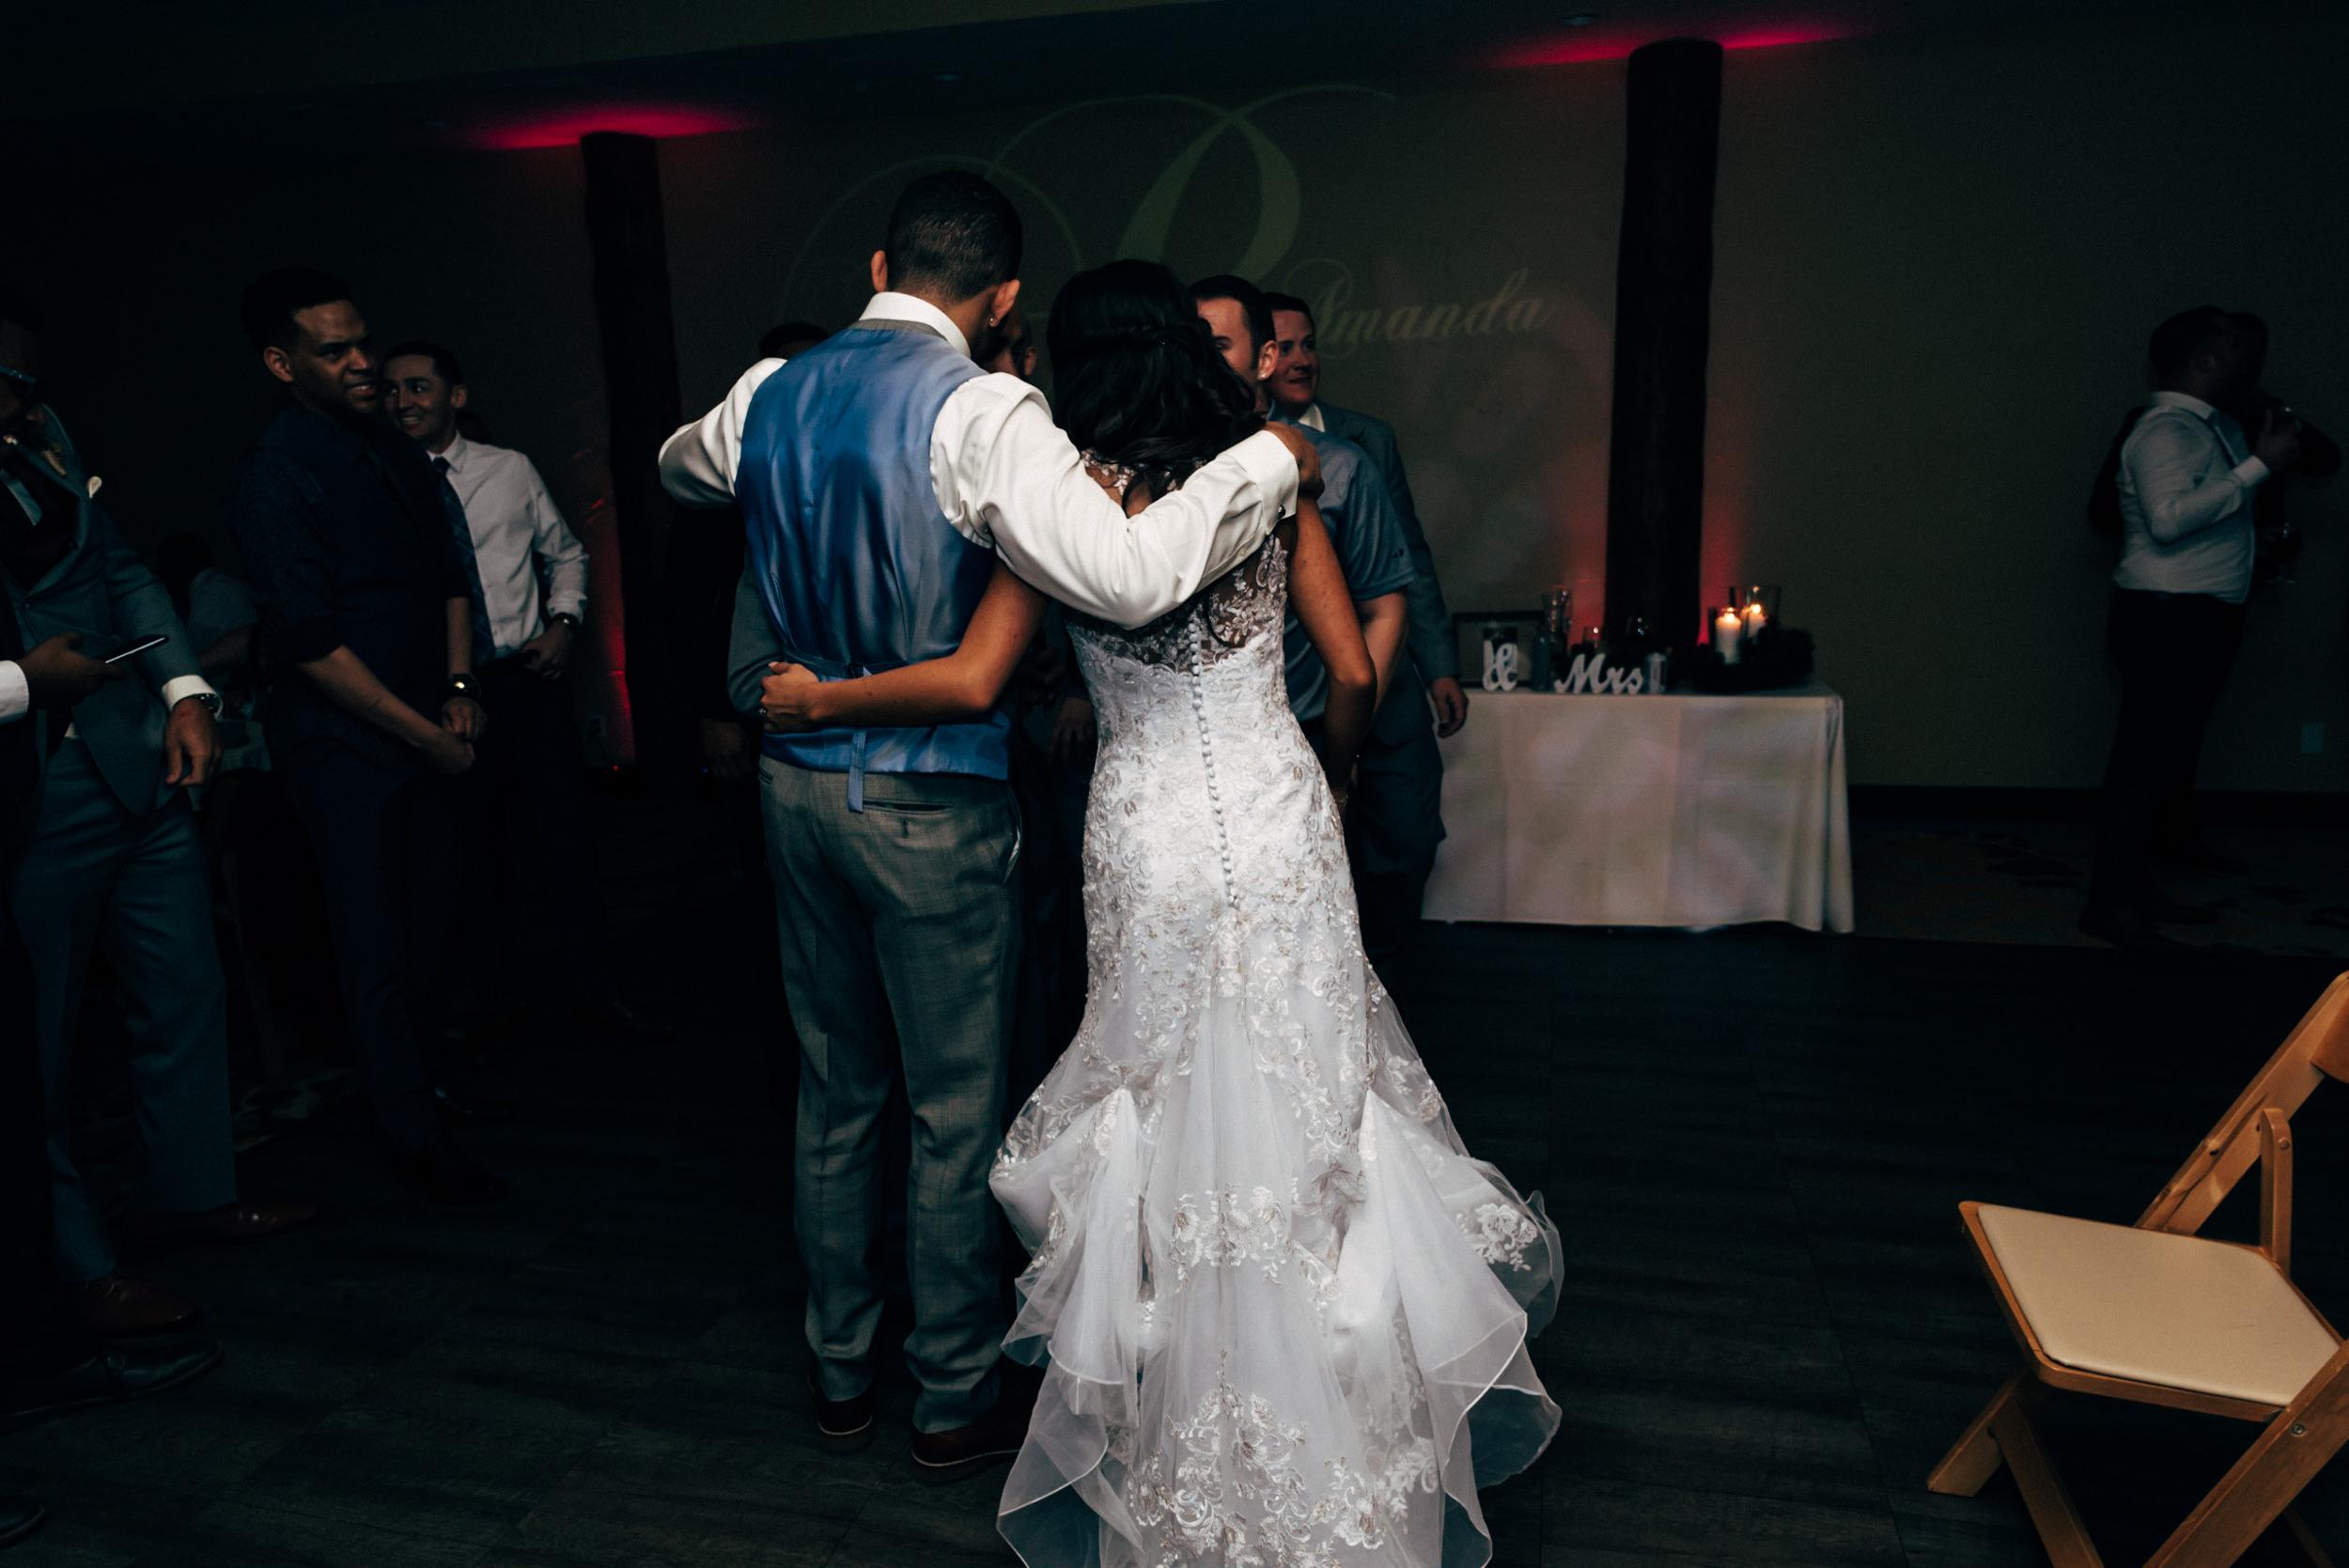 Colorado-Wedding-Photographer-Breckinridge-Mountain-Adventure-Elopement-79.jpg